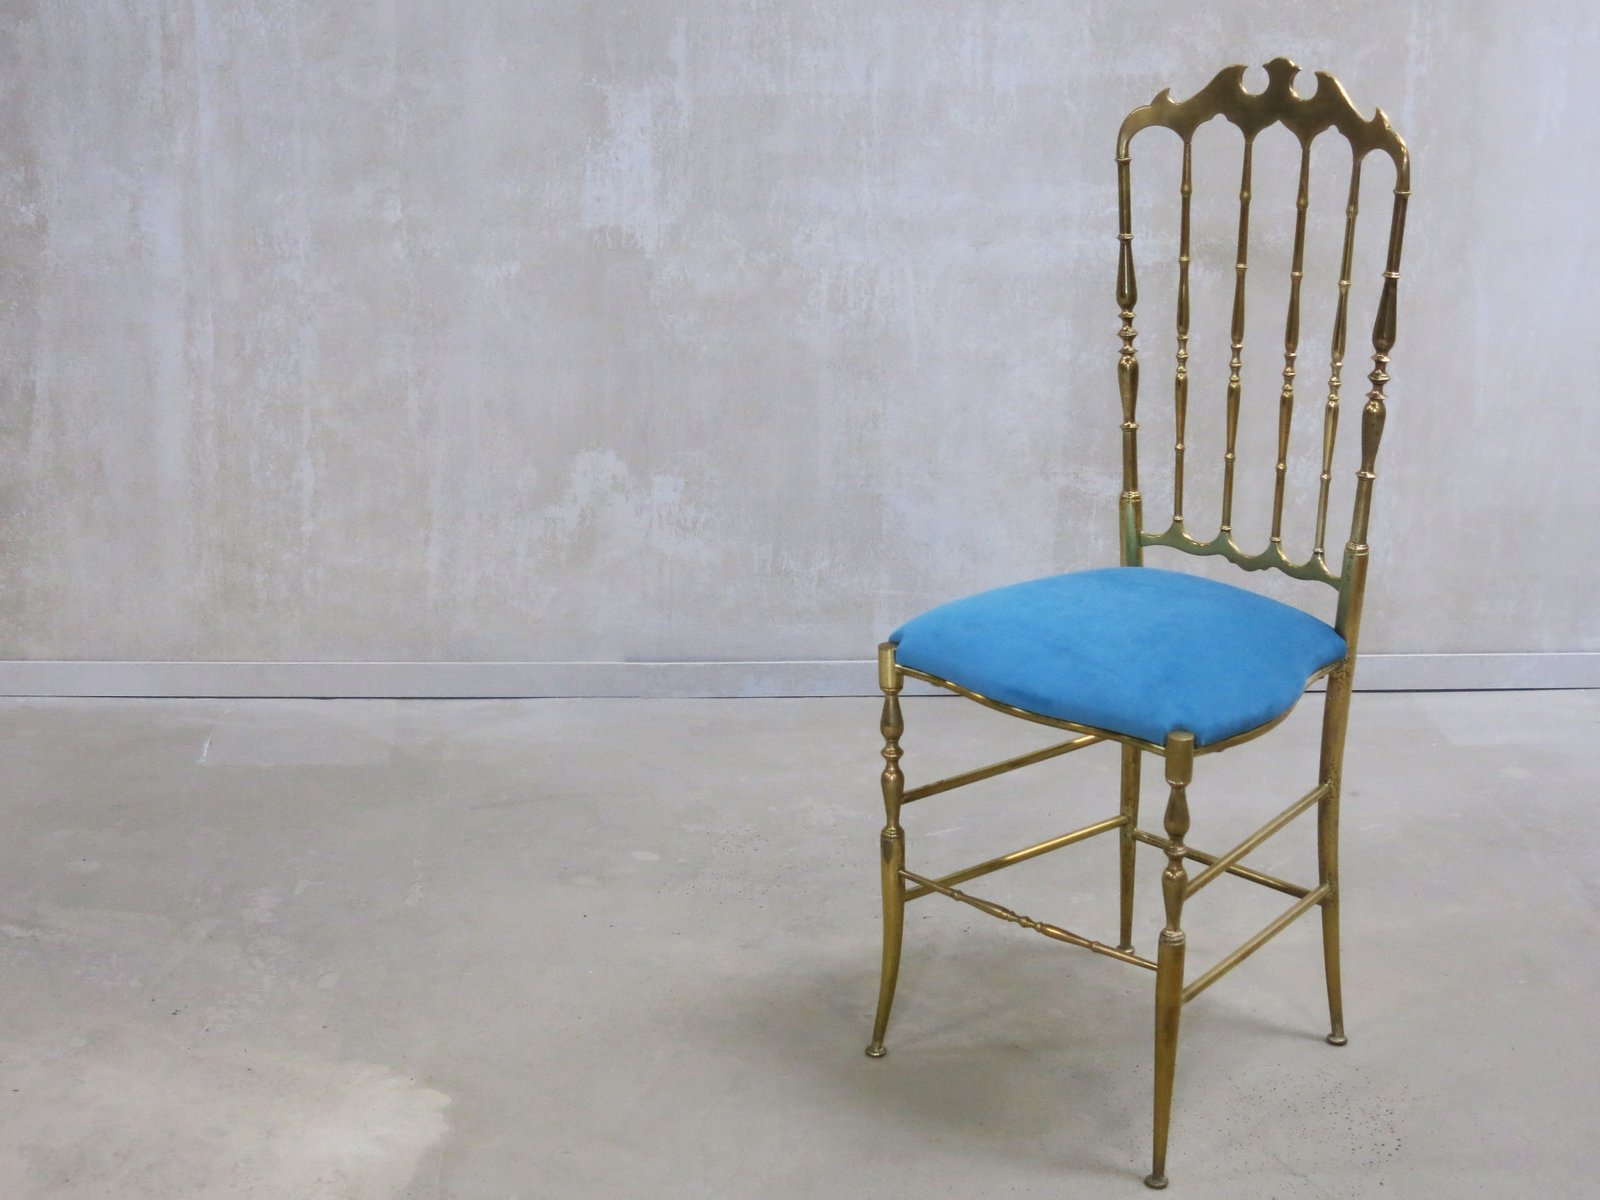 metall stuhl hohe lehne stuhl garderobe aus holz alfred with metall stuhl hohe lehne great. Black Bedroom Furniture Sets. Home Design Ideas